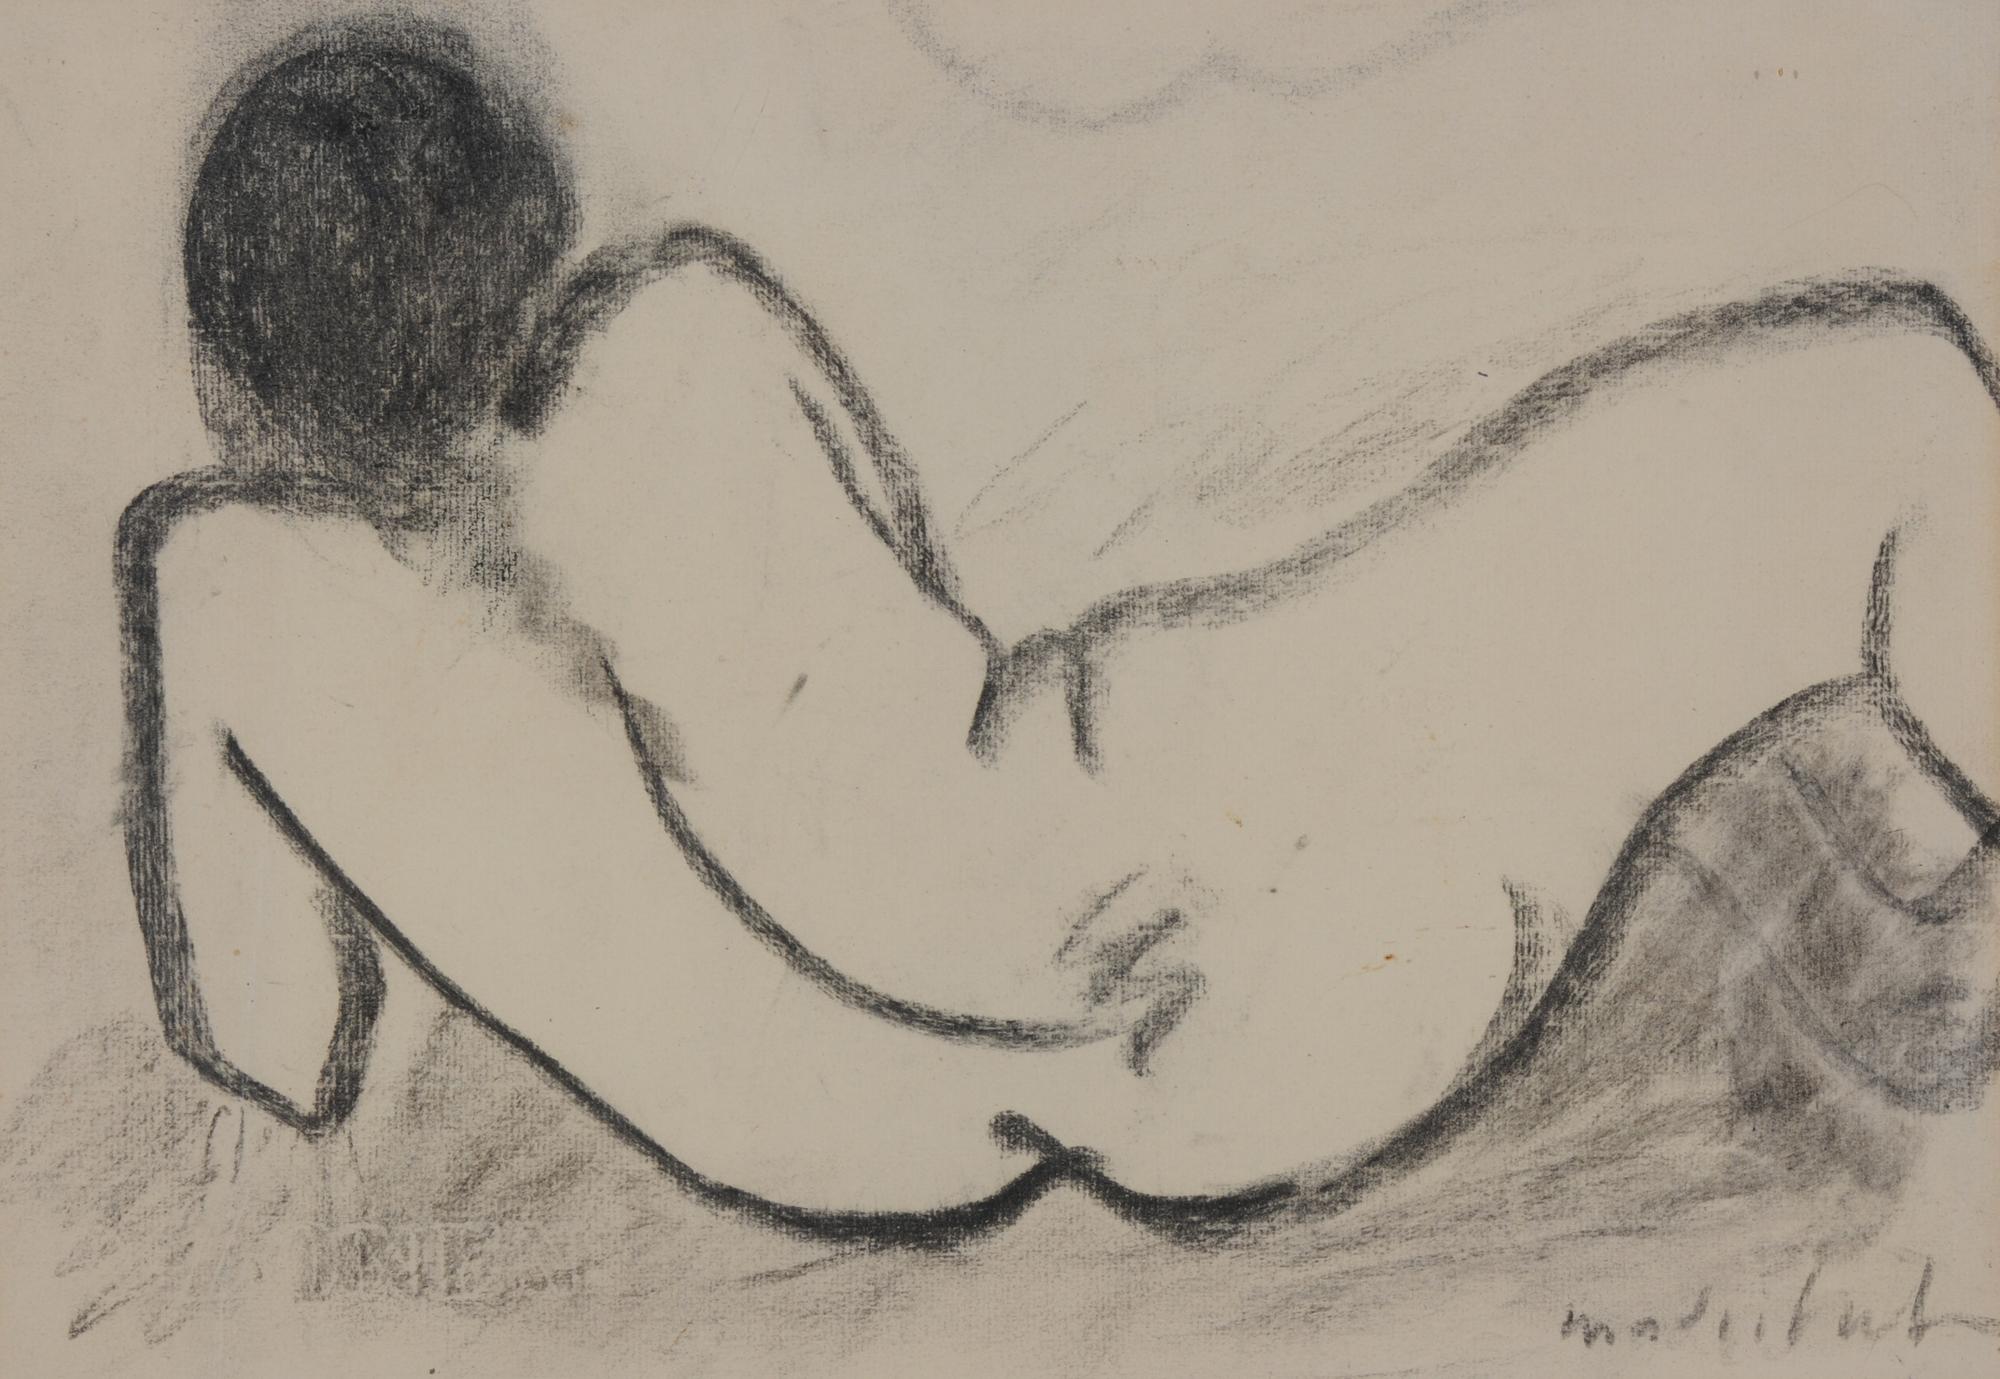 Madritsch Karl, Reclining Female Nude